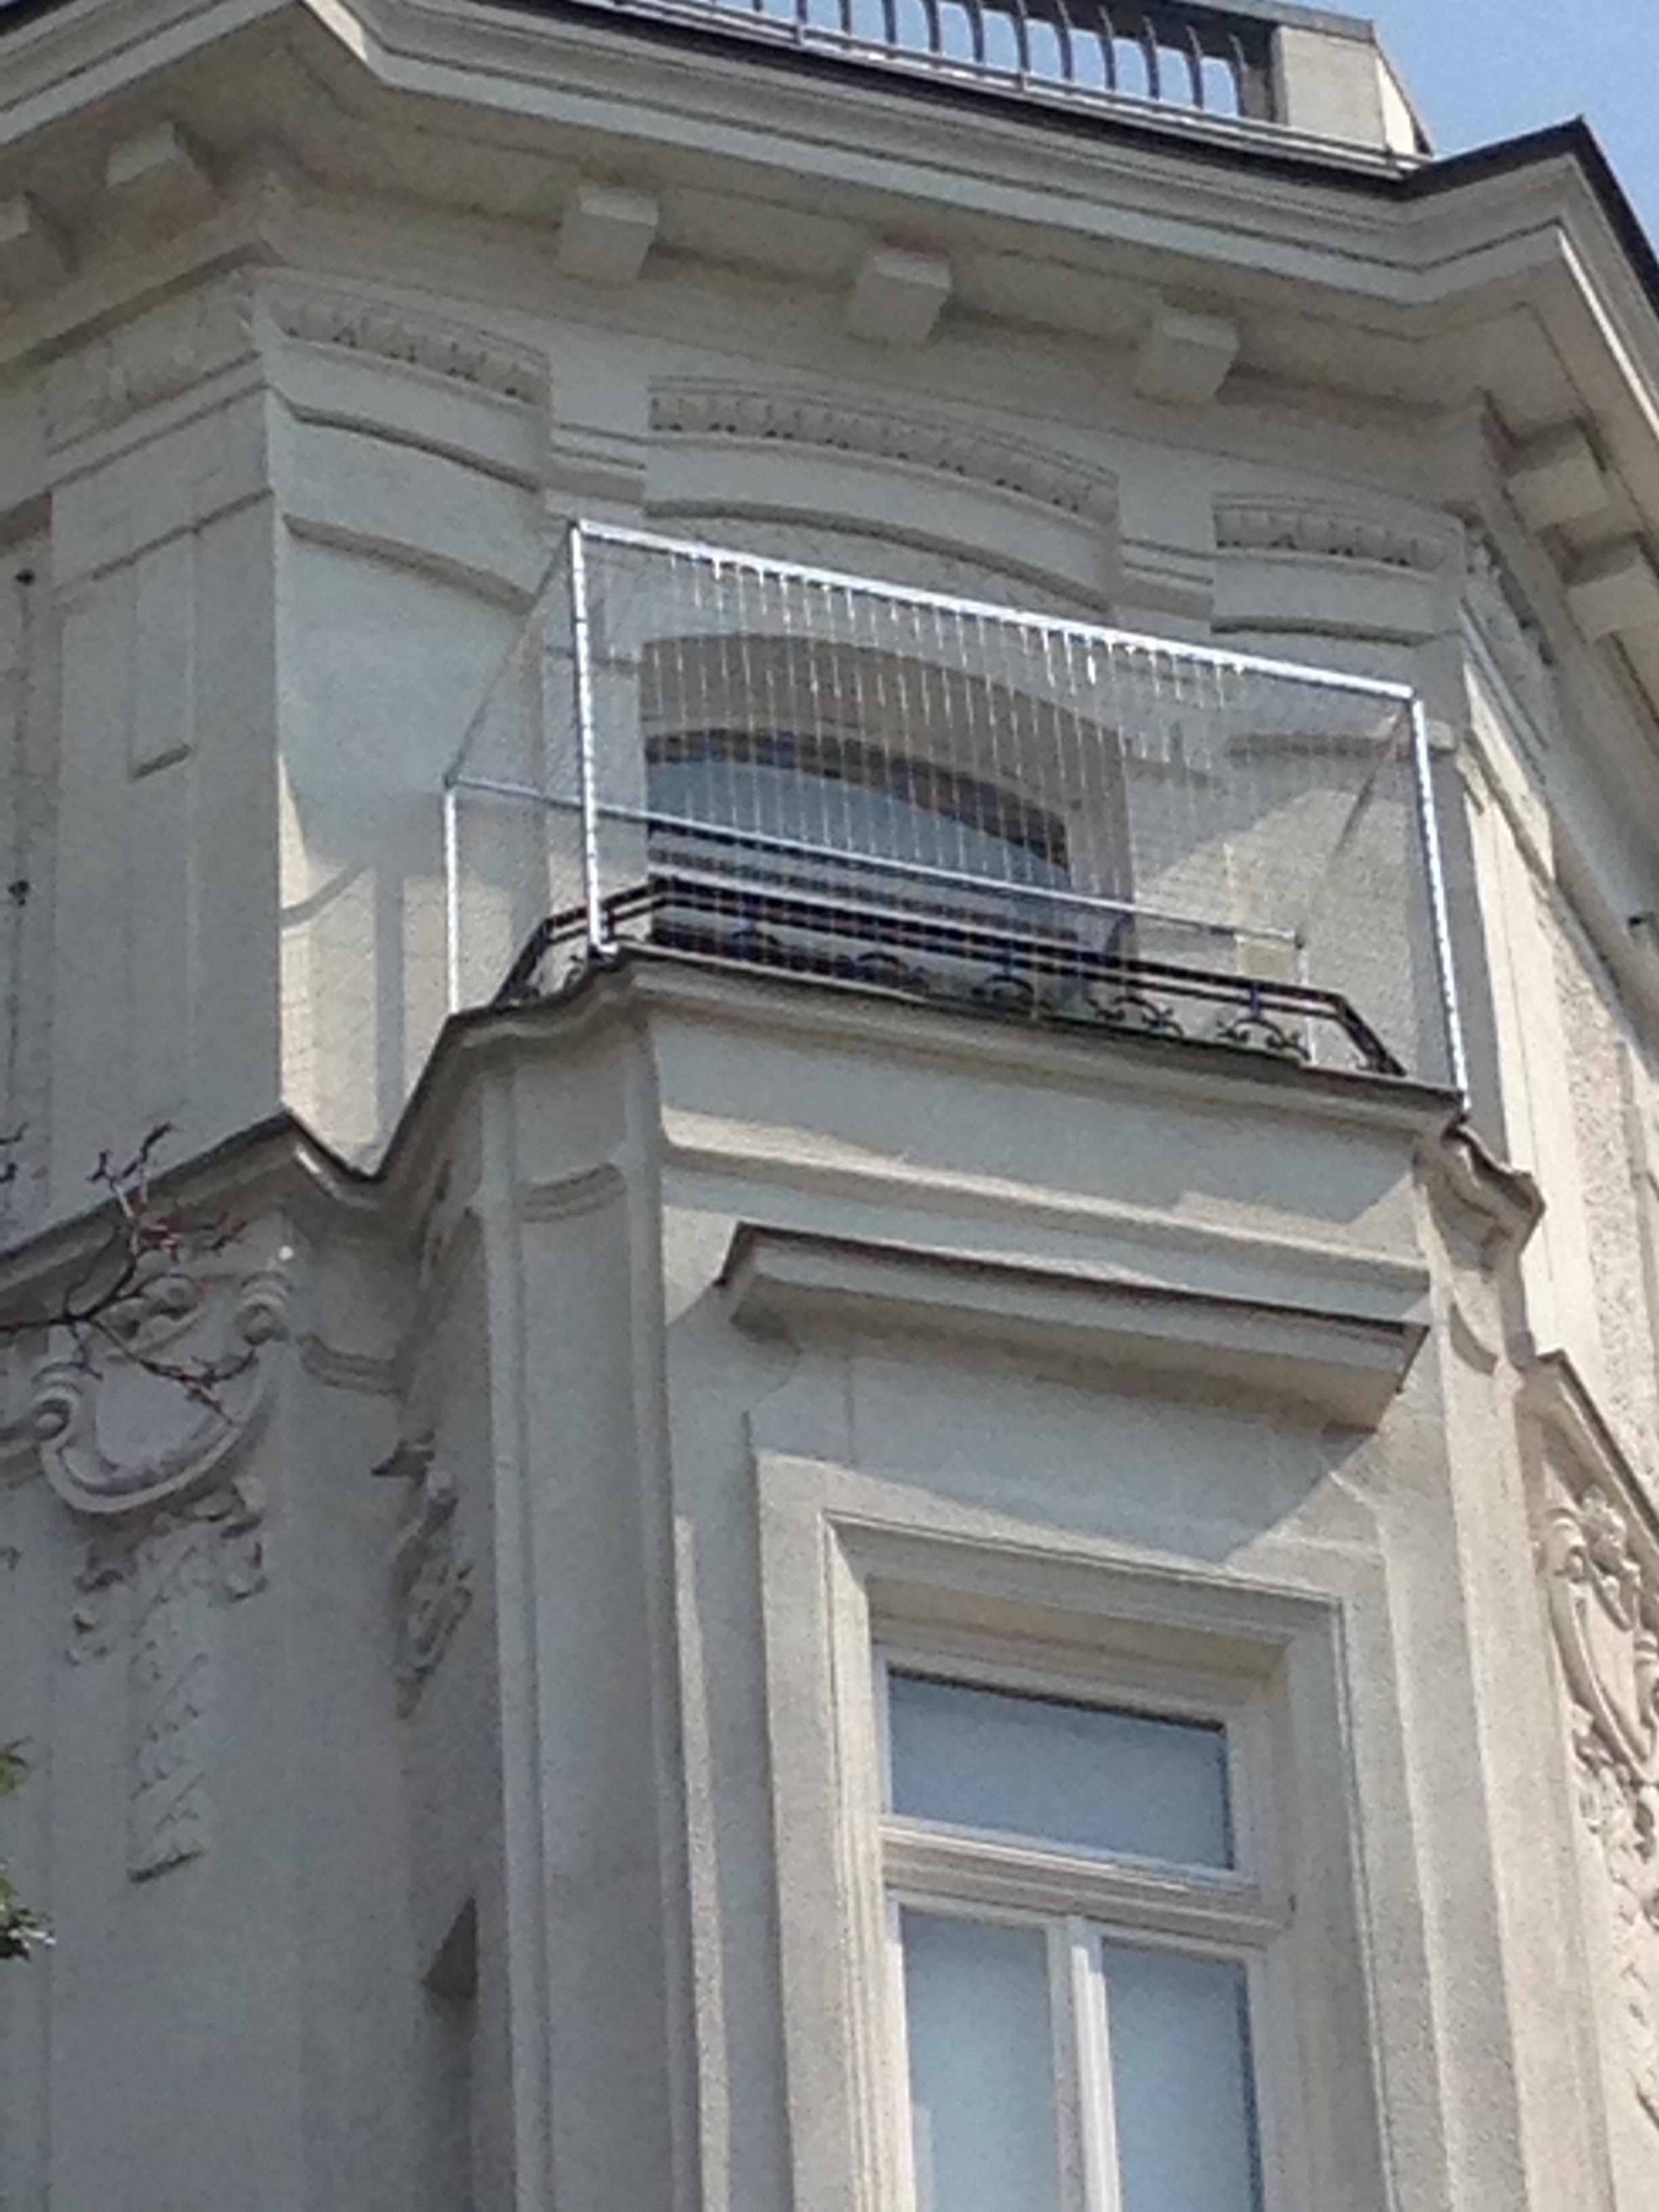 katzengitter f r loggia und balkon. Black Bedroom Furniture Sets. Home Design Ideas